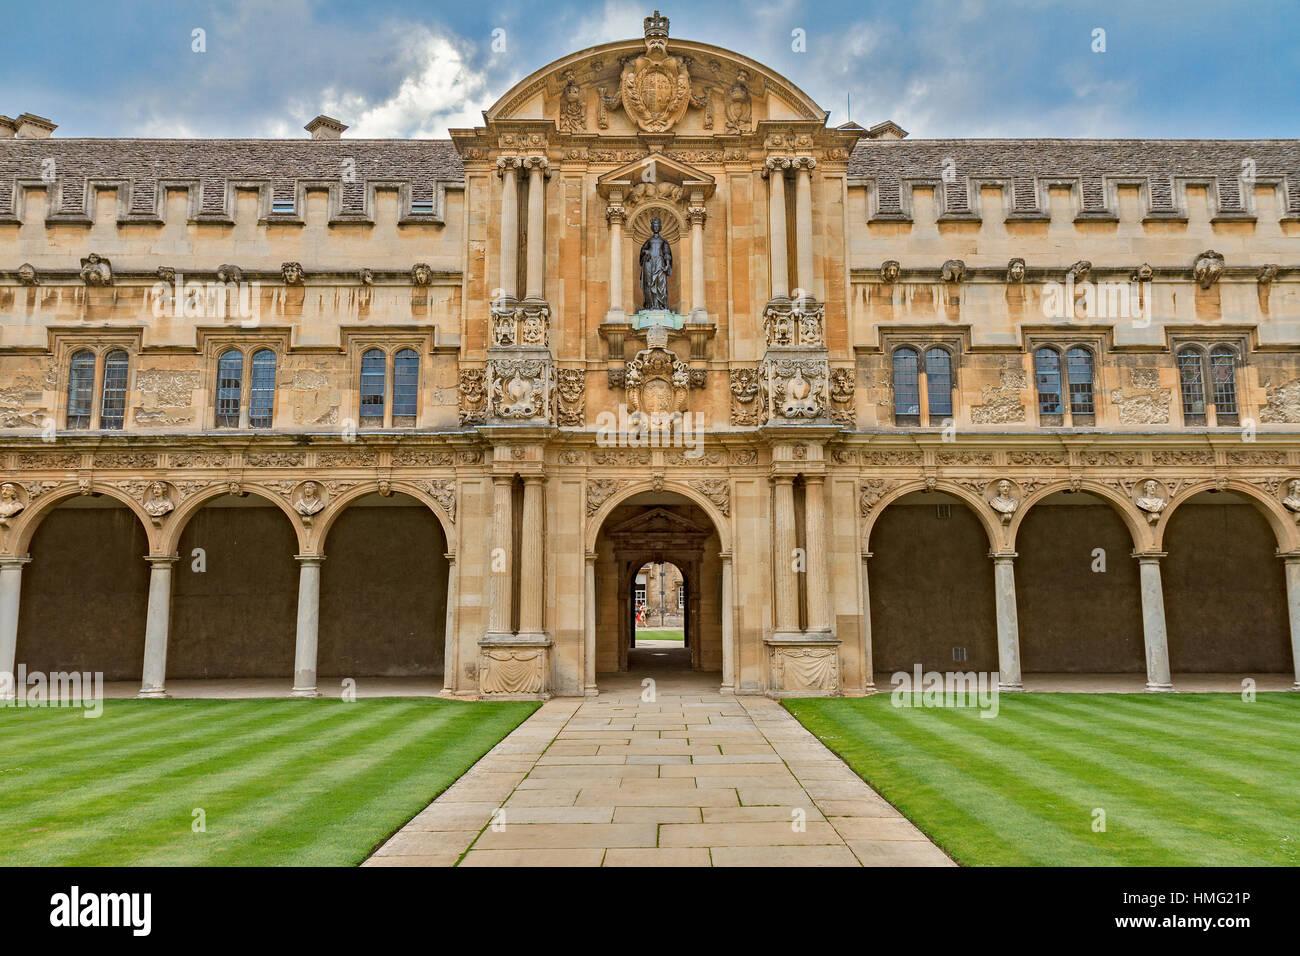 Front Of Rear Quadrangle St. John's College Oxford UK - Stock Image